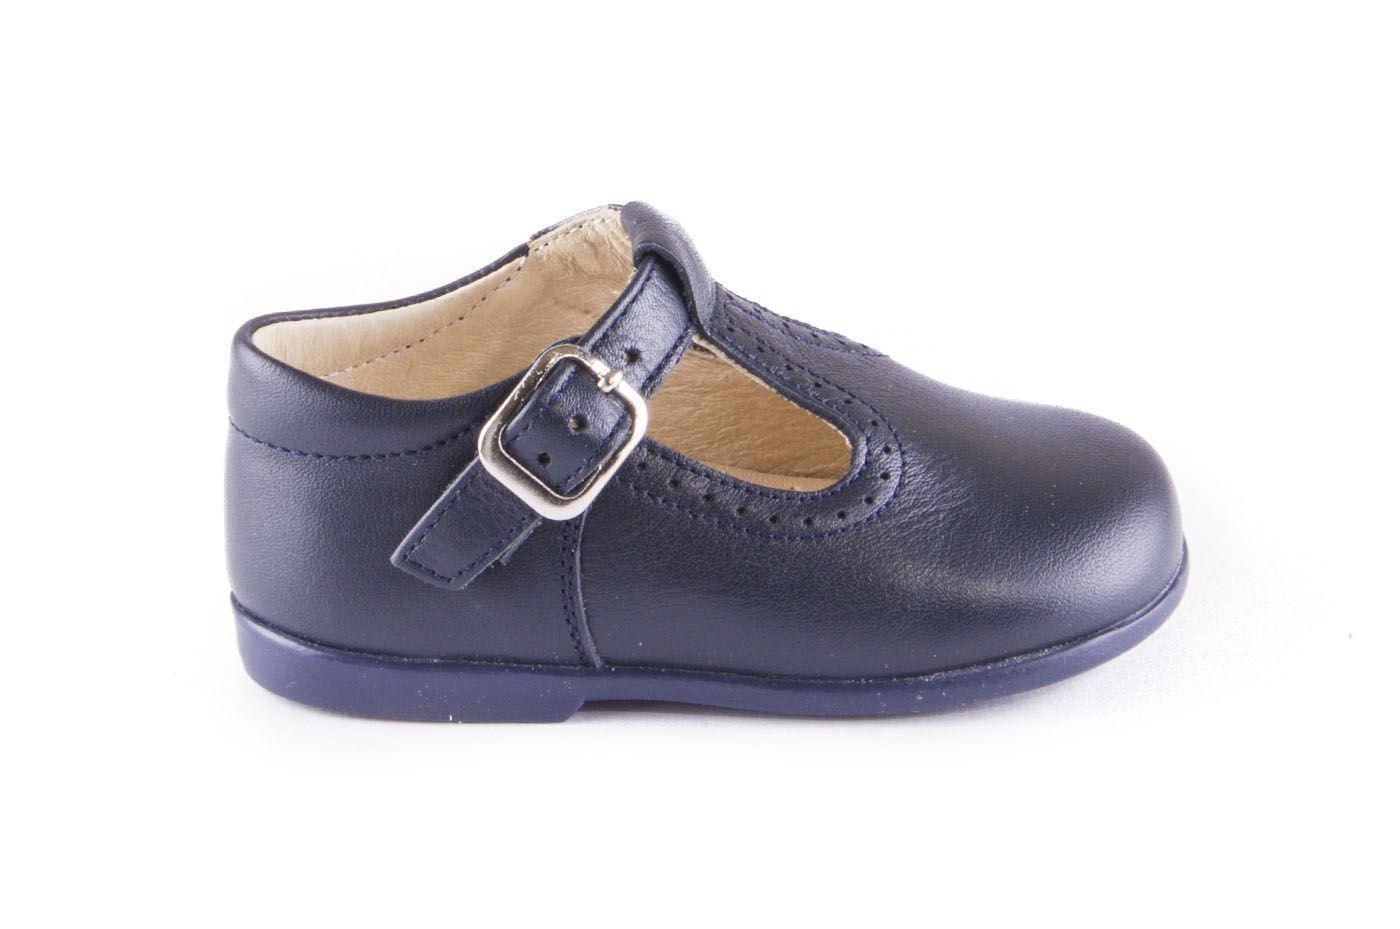 cfb9092fe4 Comprar zapato tipo PREANDANTE NIÑO estilo SANDALIA INGLESA COLOR ...